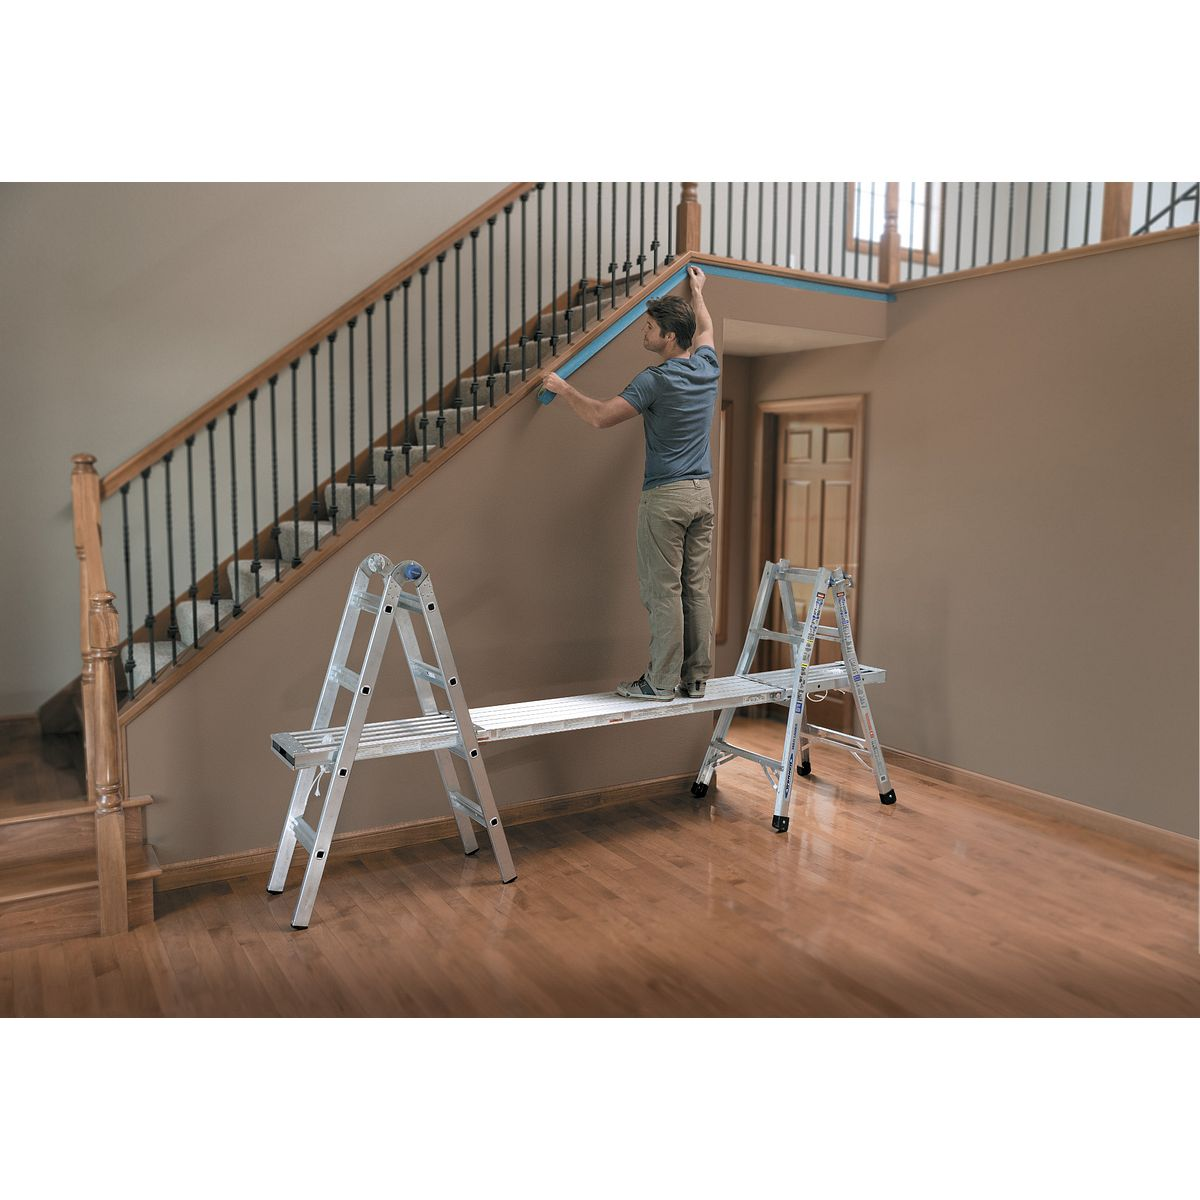 Mt 17 Multi Purpose Ladders Werner Us